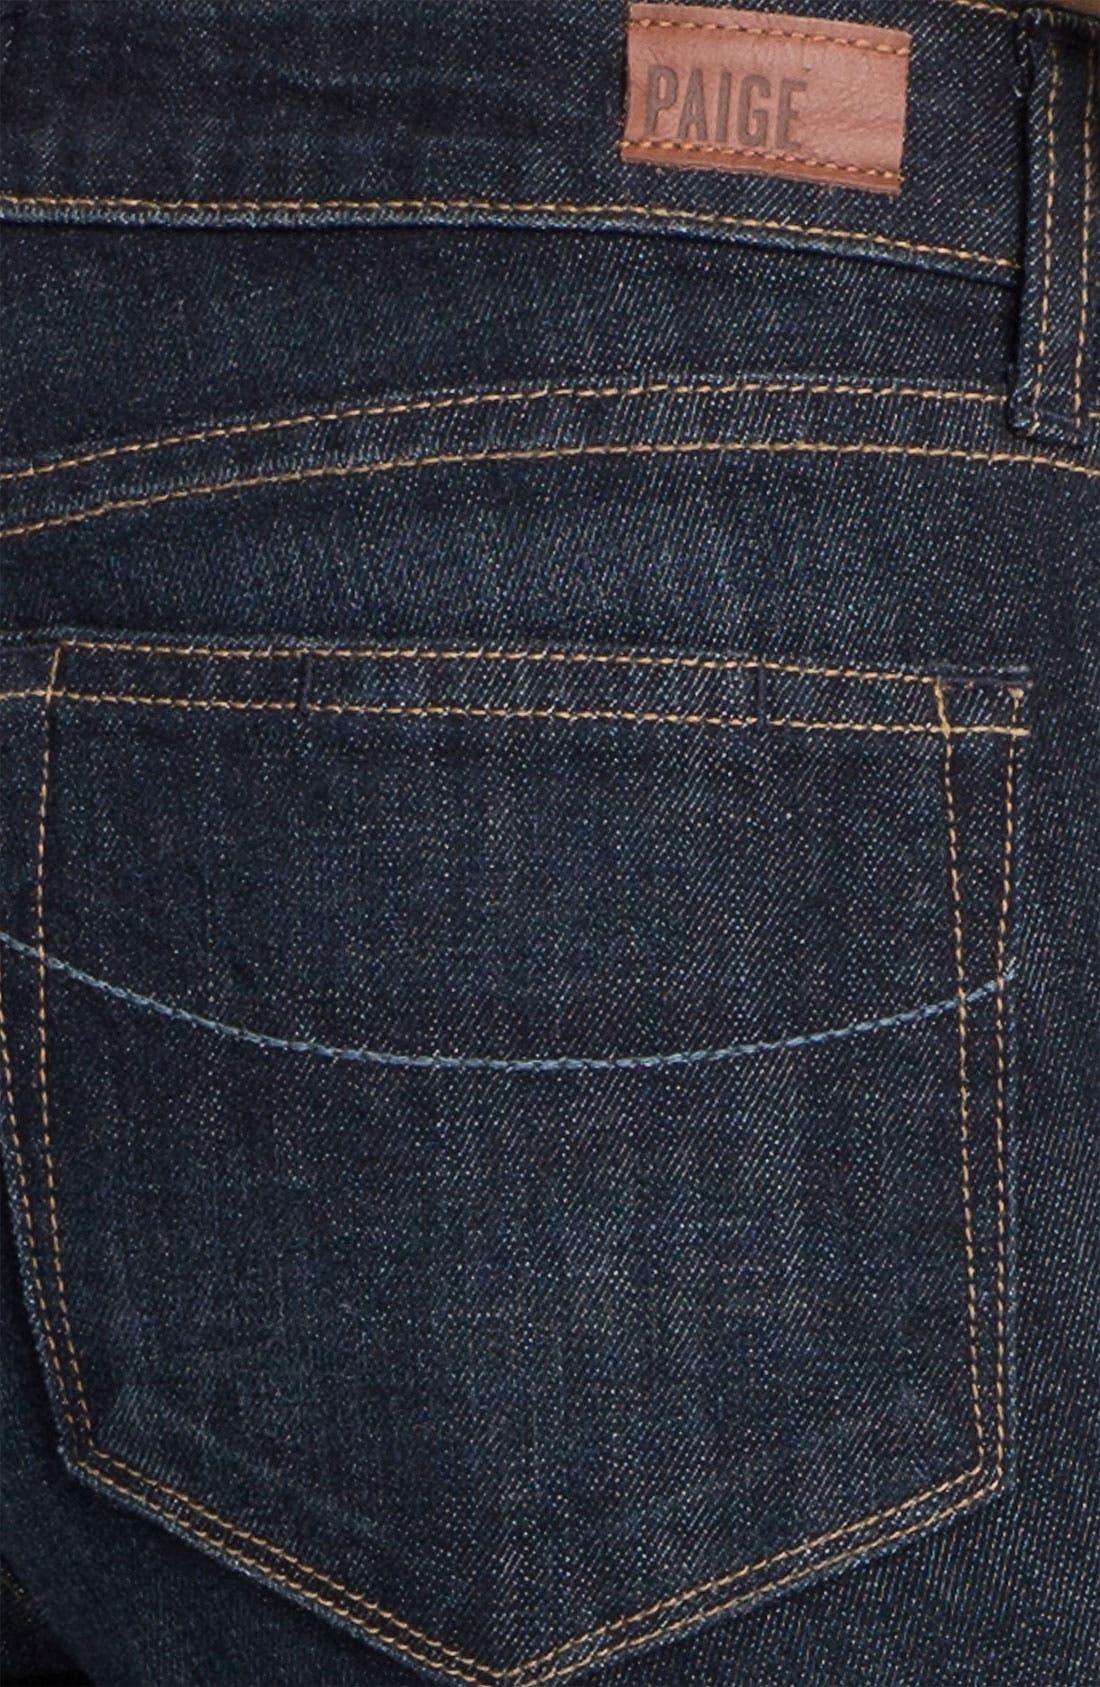 Alternate Image 3  - Paige Denim 'Jax' Stretch Denim Bermuda Shorts (Dean Wash)